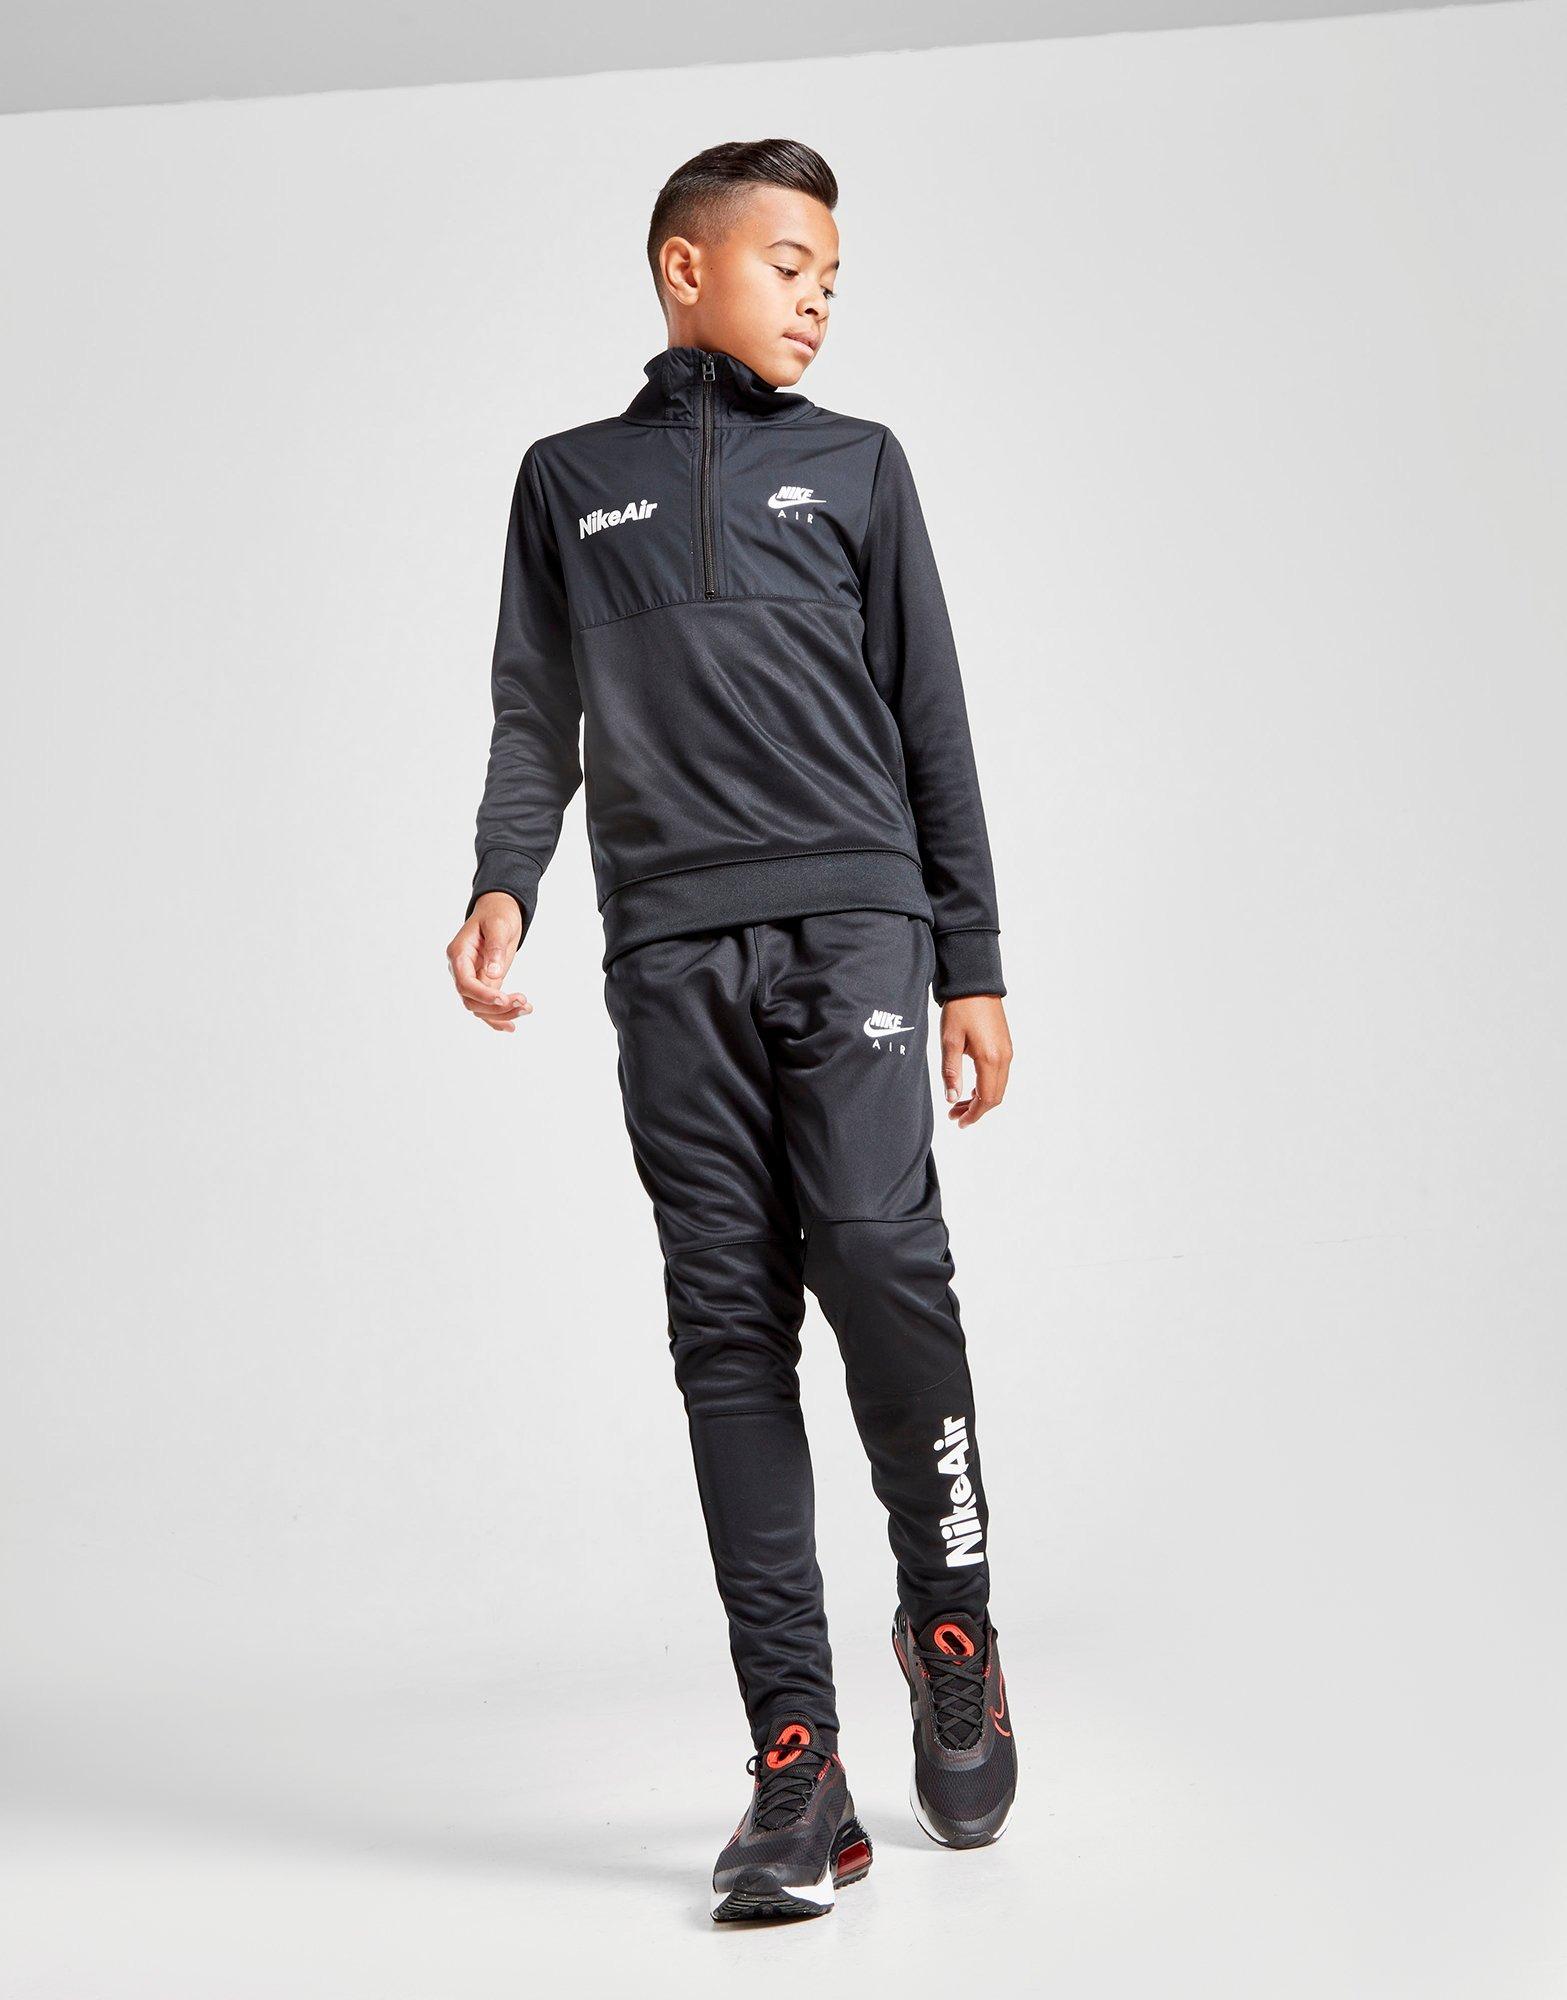 Buy Nike Air Tracksuit Junior Jd Sports